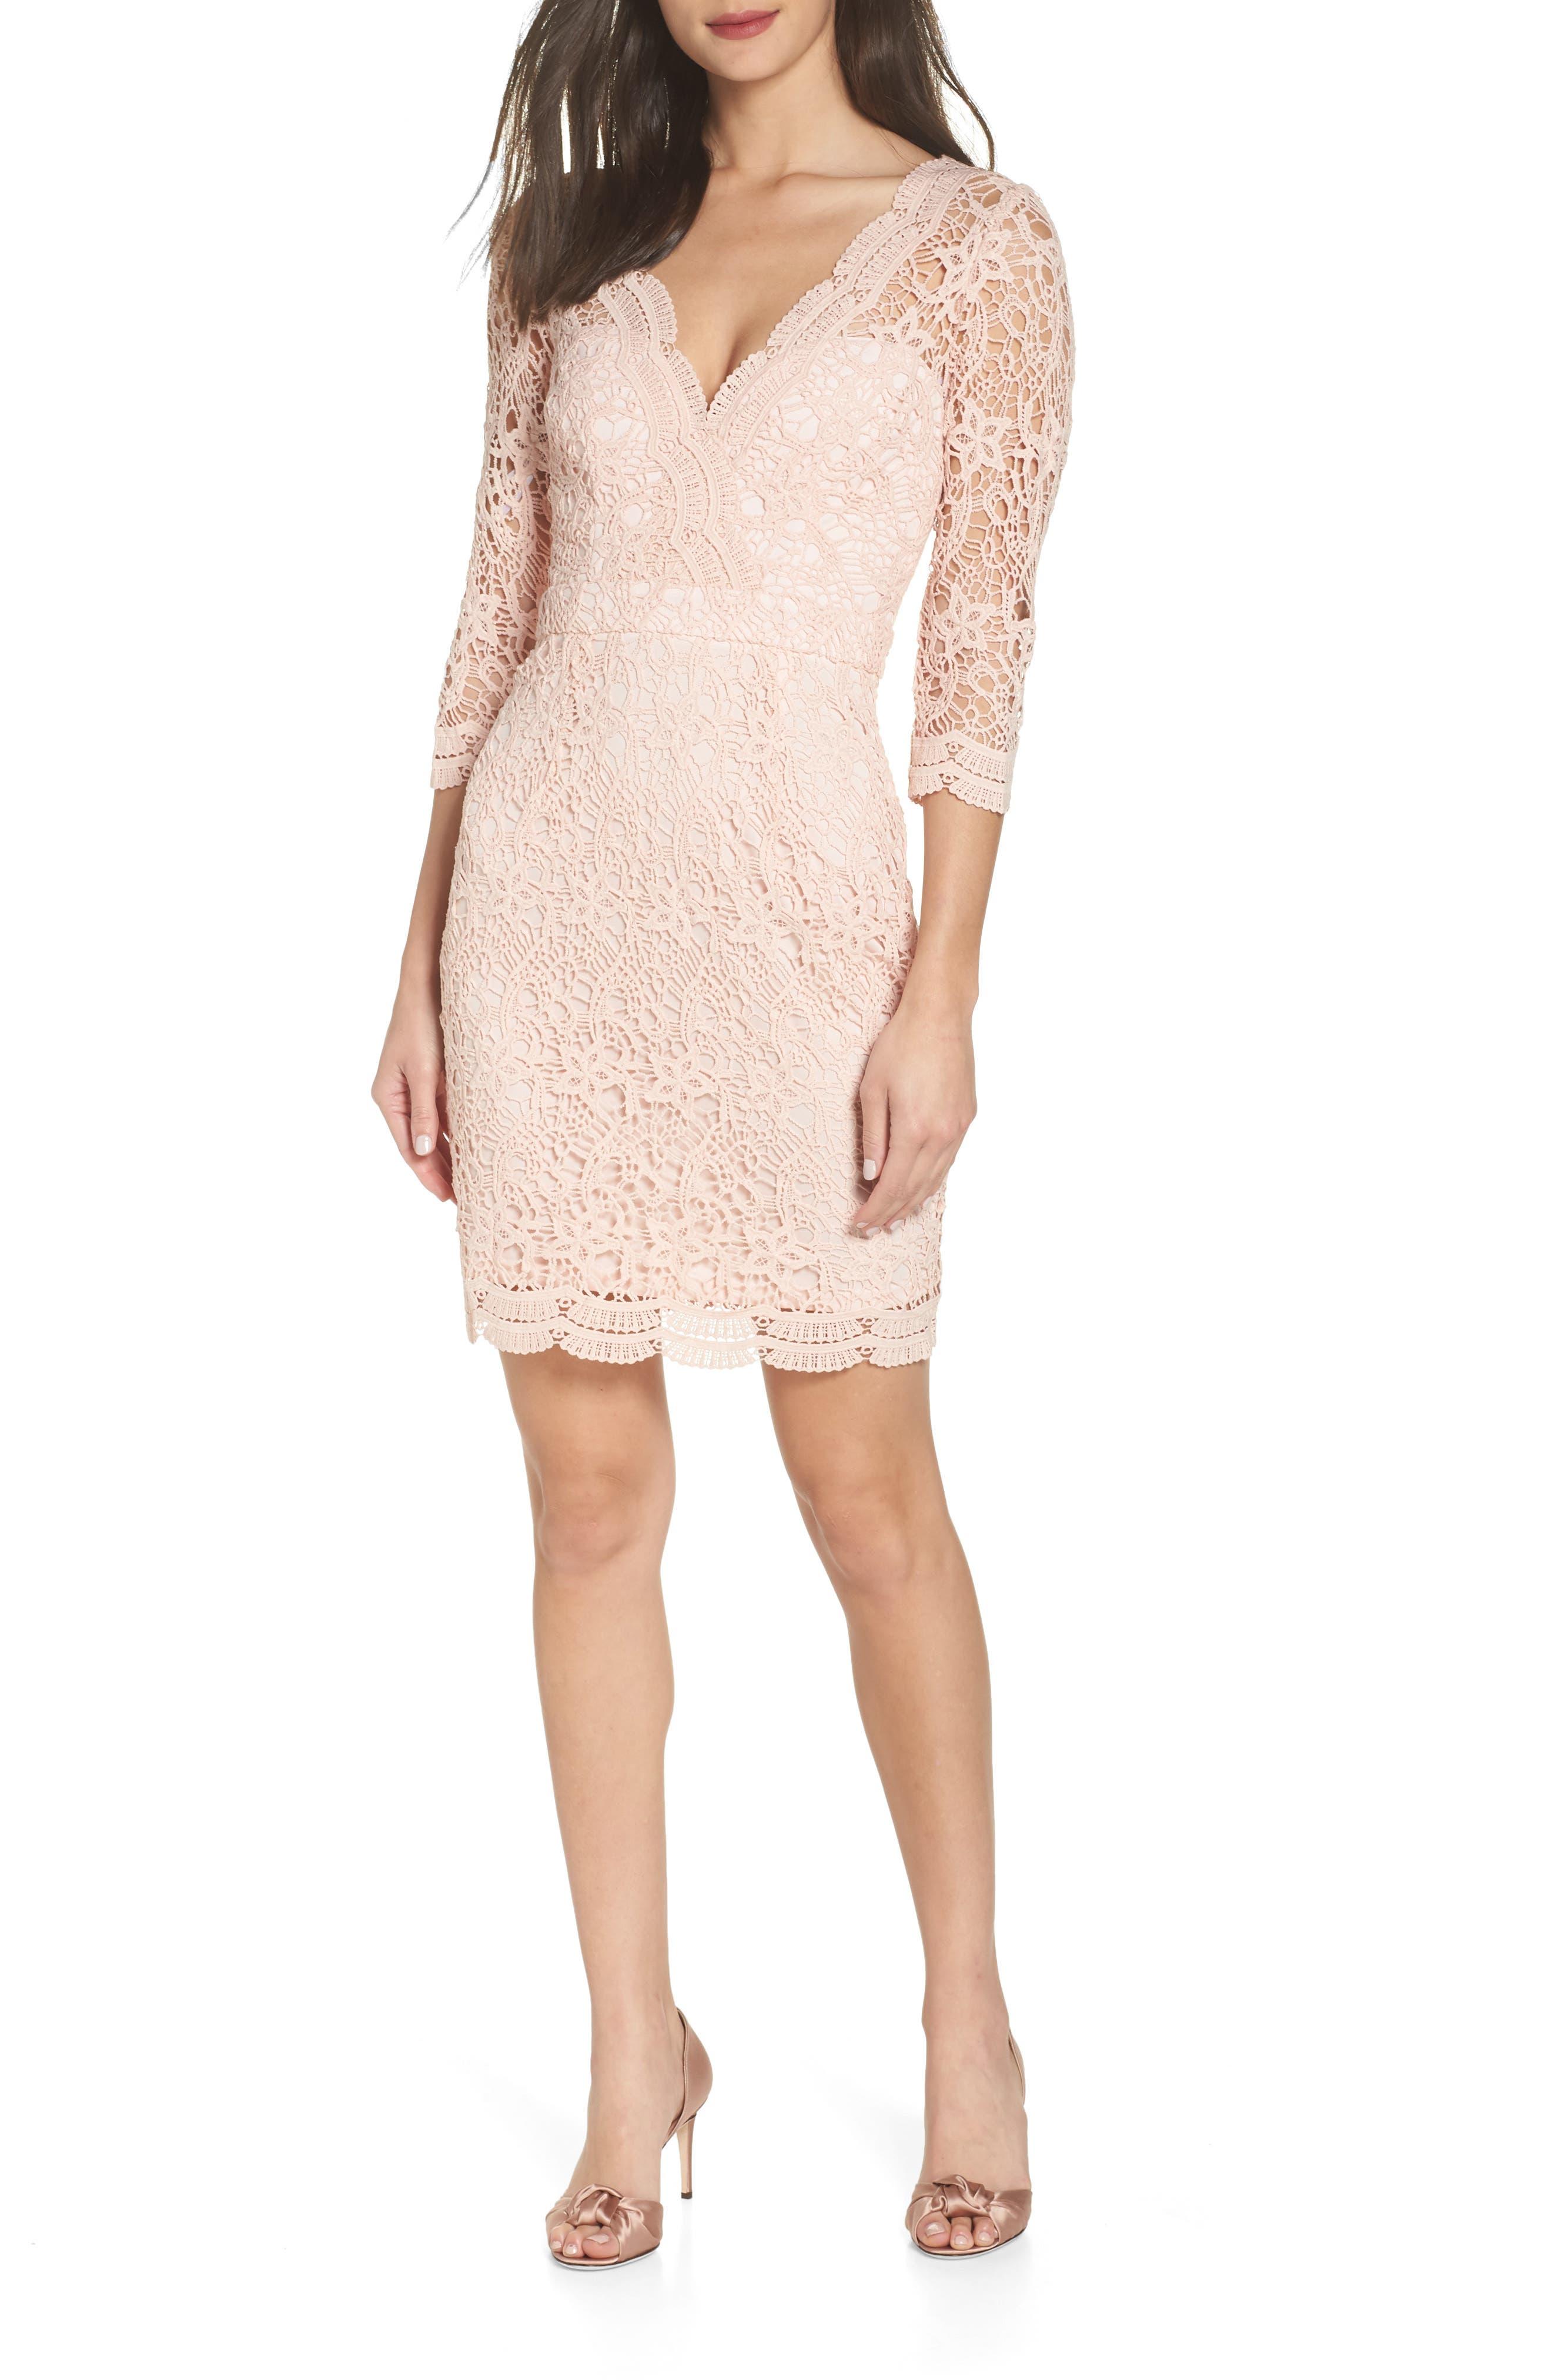 Lulus Lace Cocktail Dress, Pink